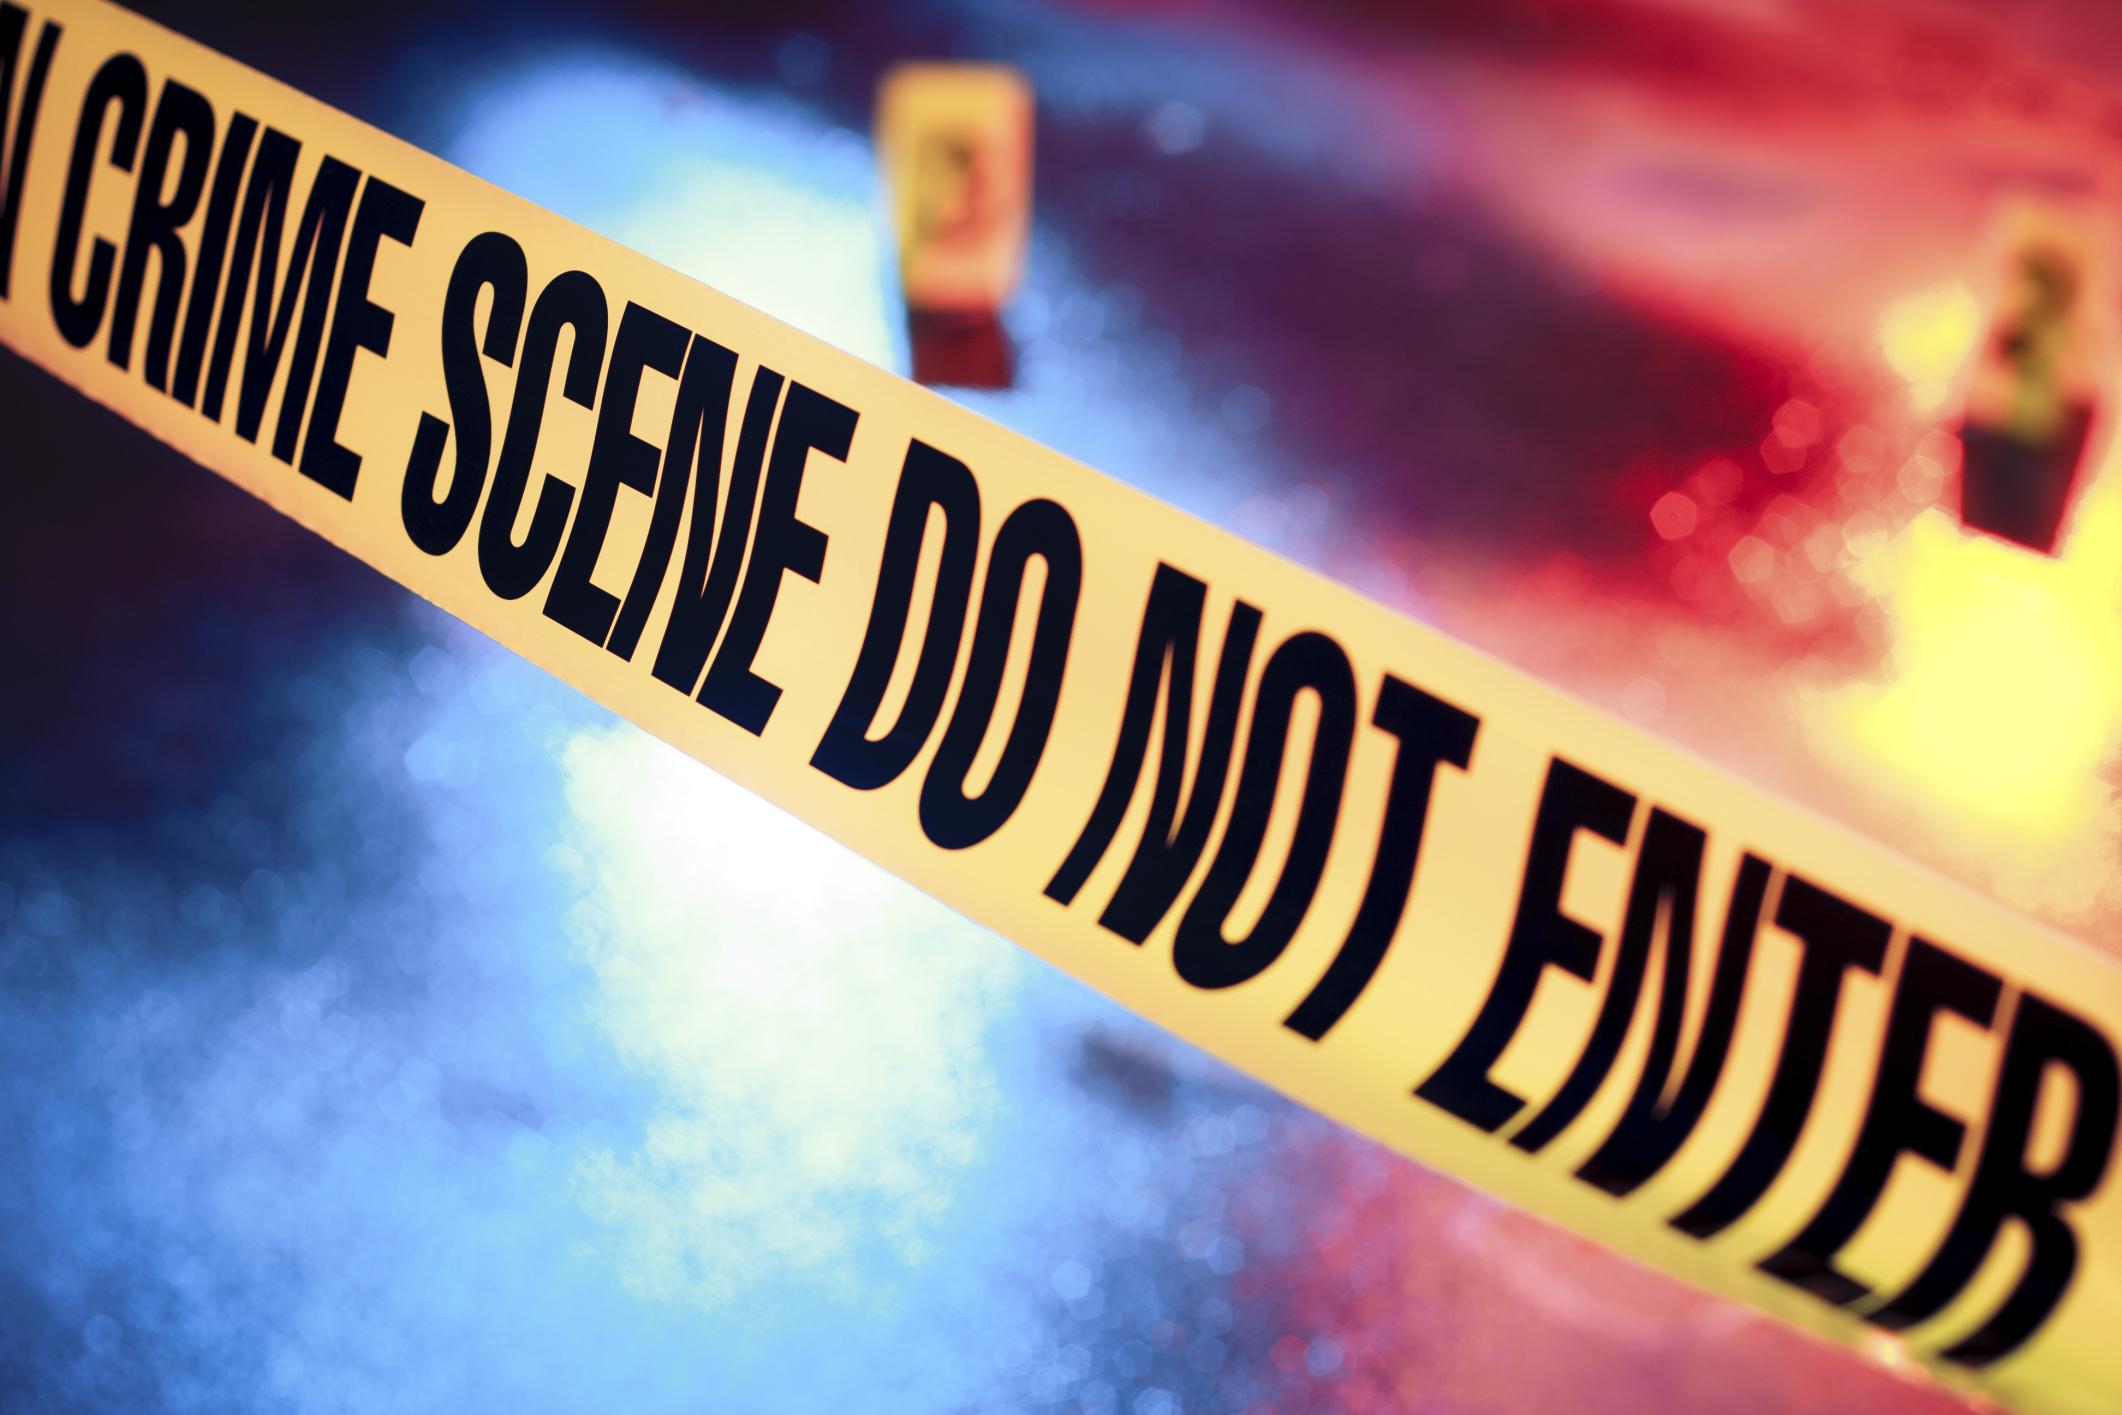 TS-462193457 Crime Scene tape